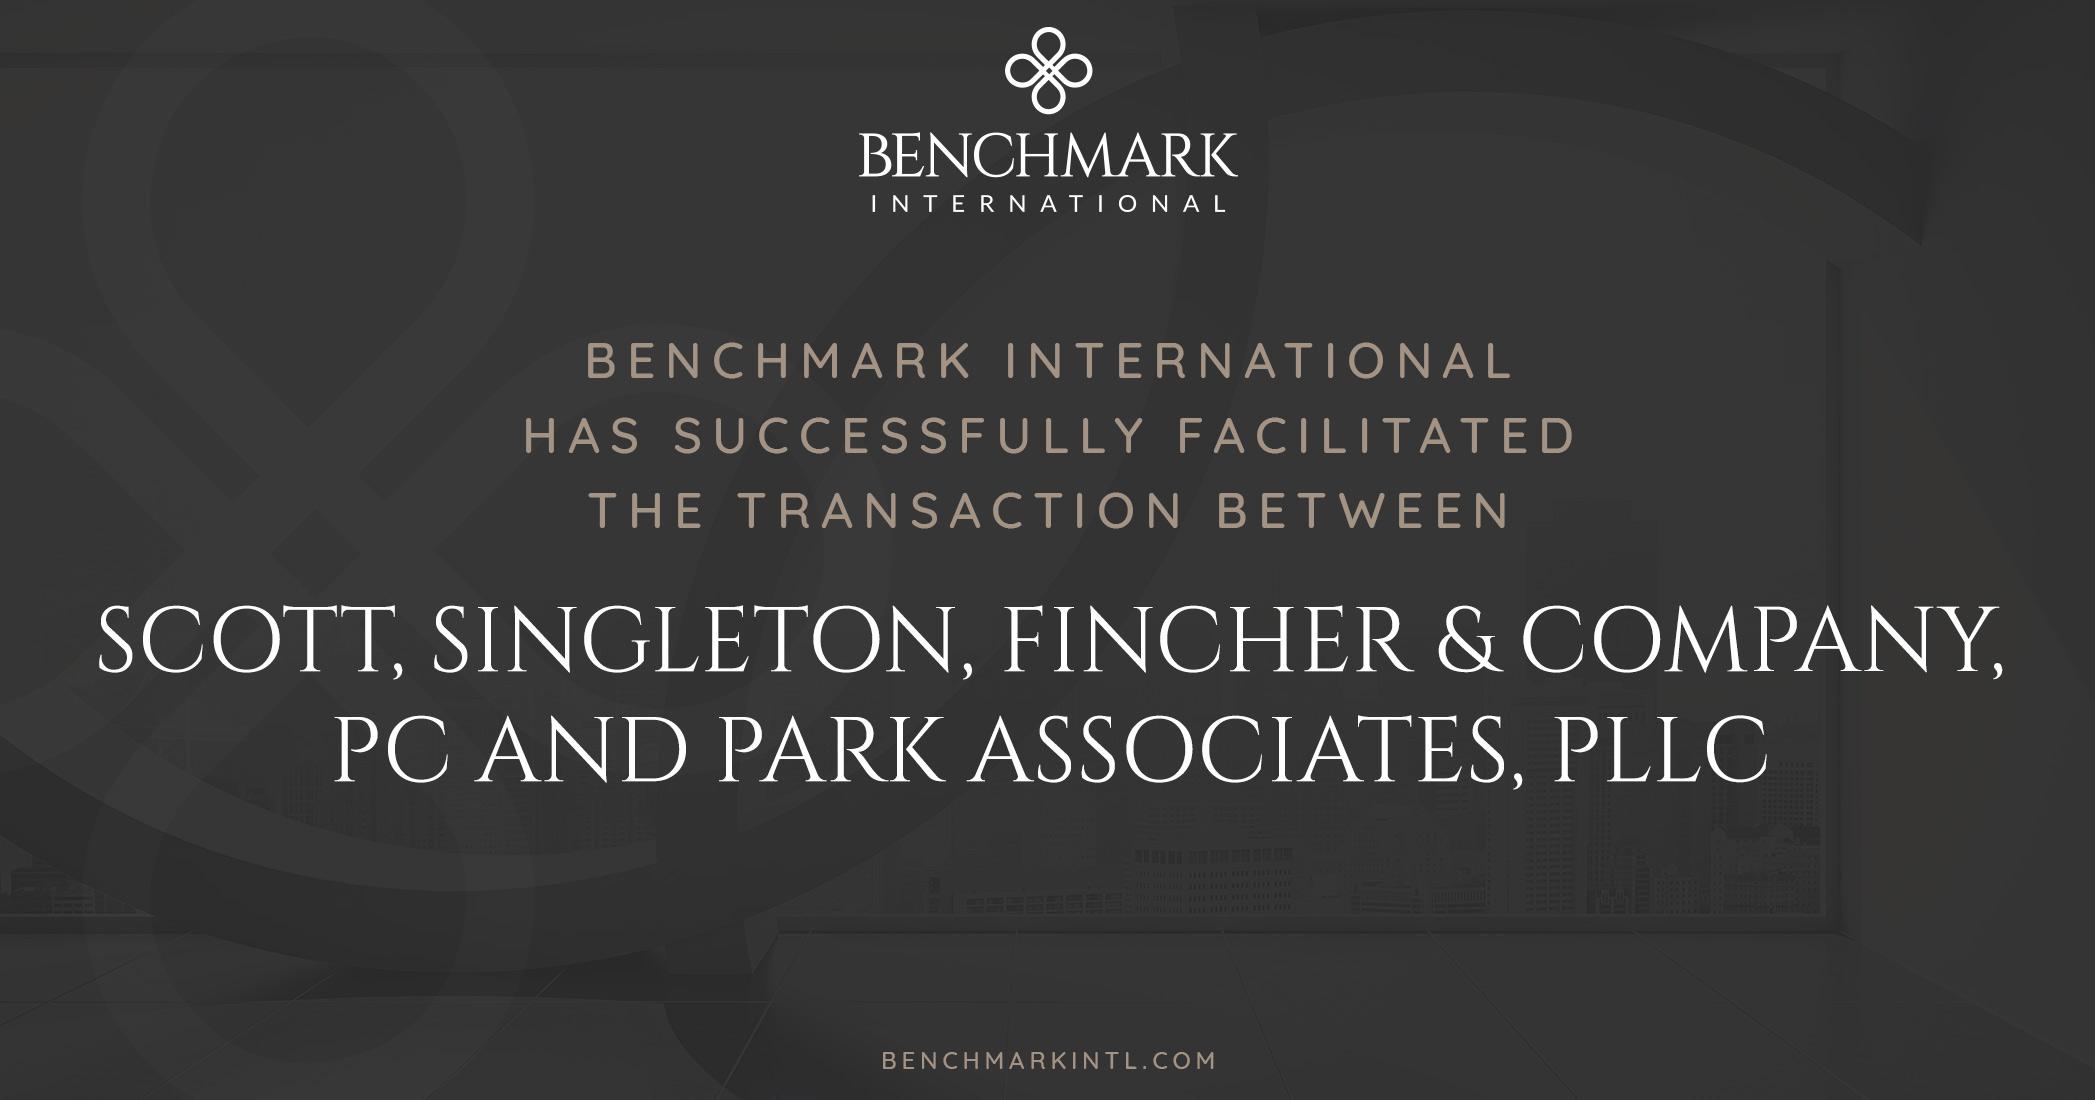 Benchmark International Successfully Facilitated the Transaction Between Scott, Singleton, Fincher & Company, PC and Park Associates, PLLC